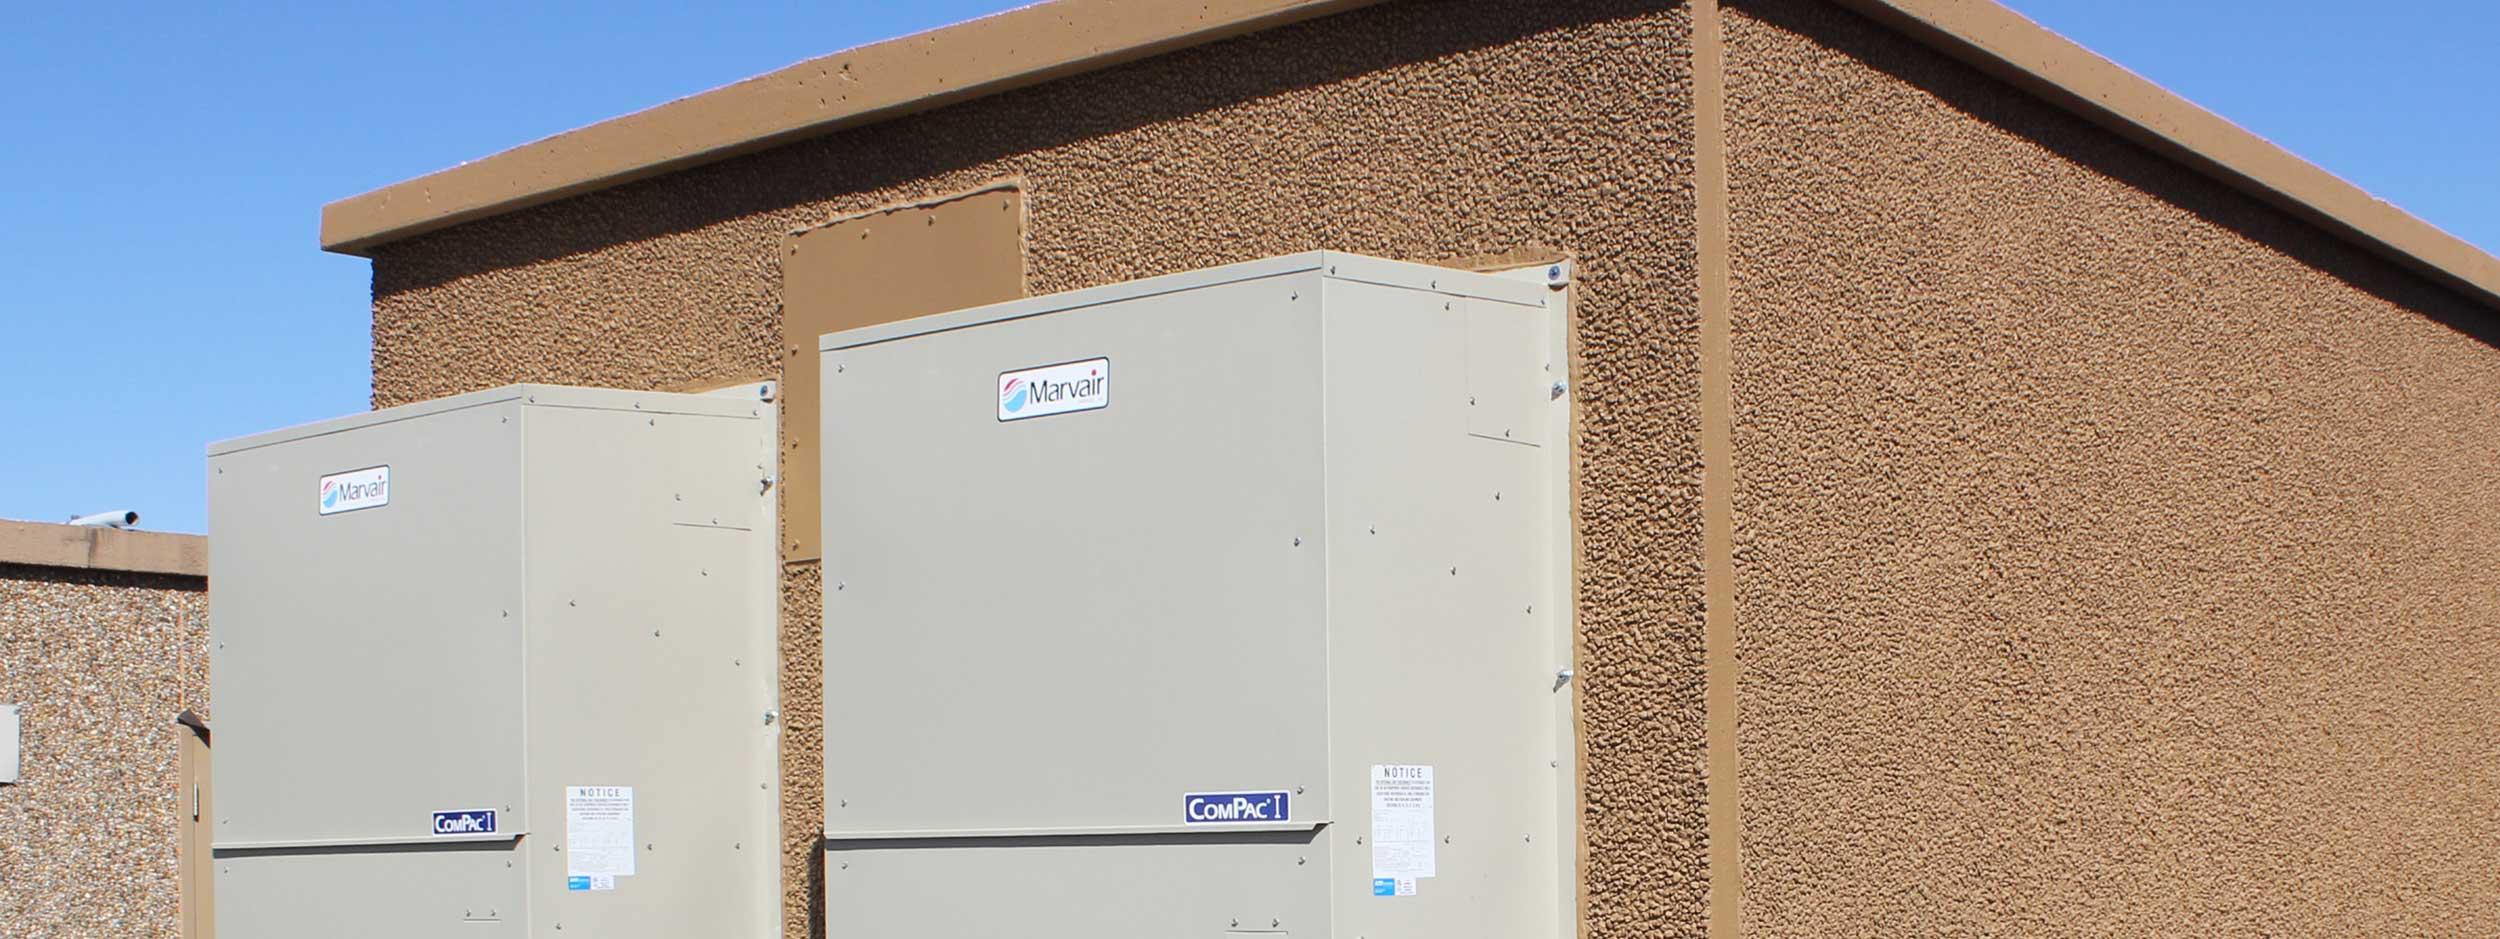 telecom-shelters-small-height.jpg